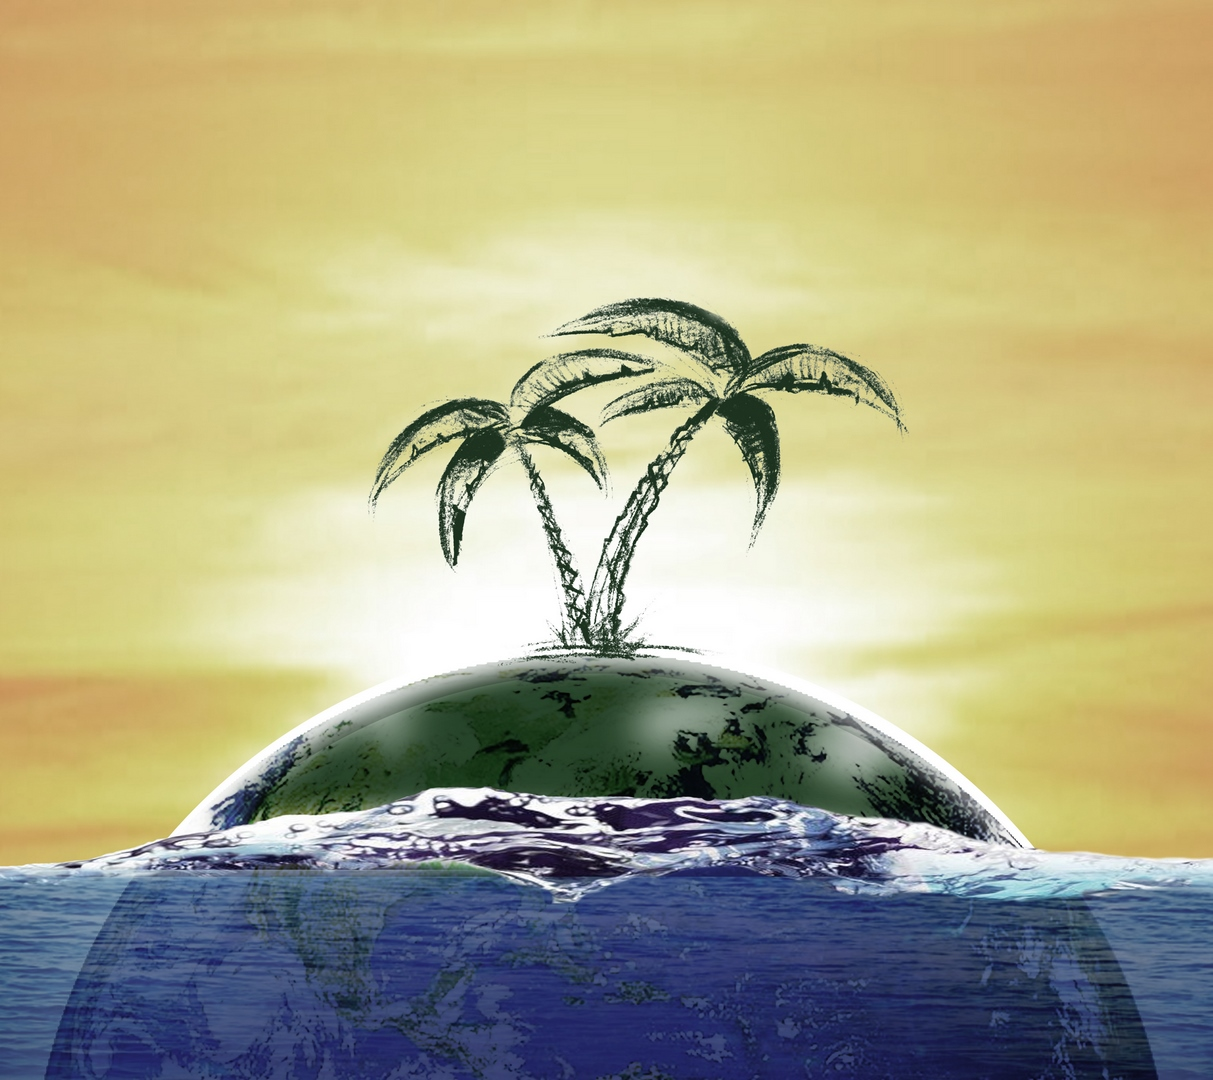 L'utopie ou l'improbable naufrage